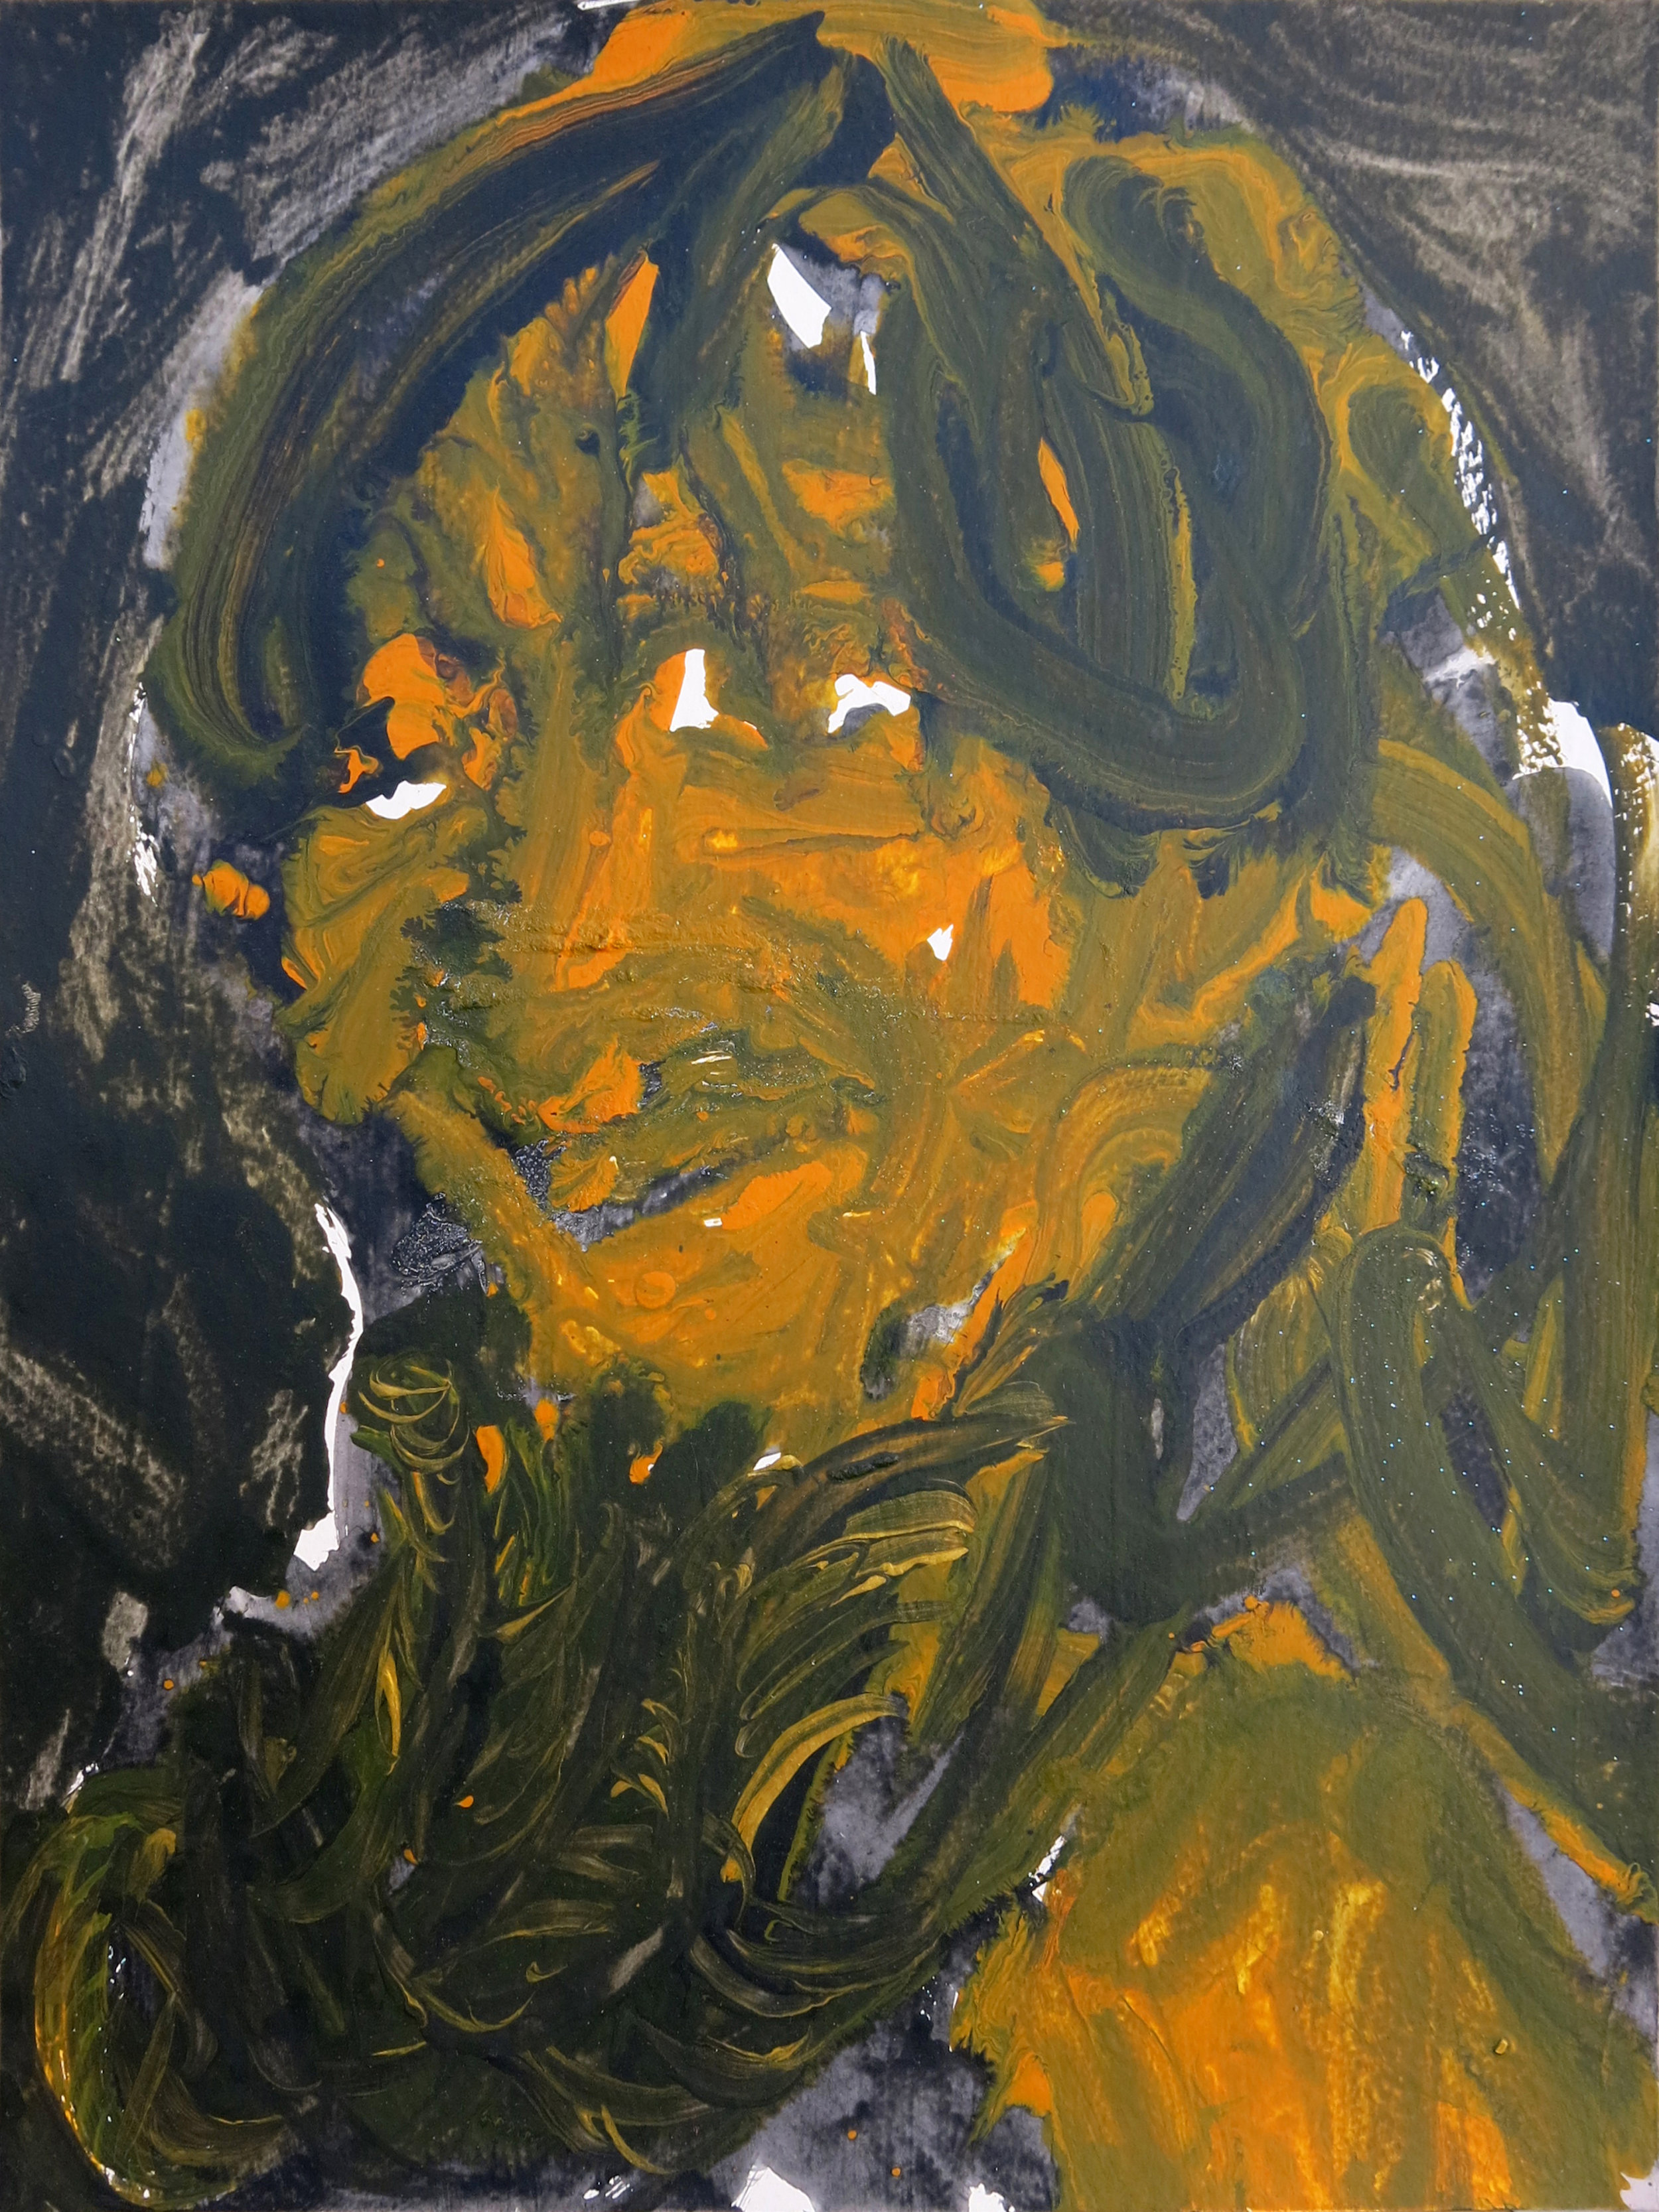 Barbra Streisand Portrait #1